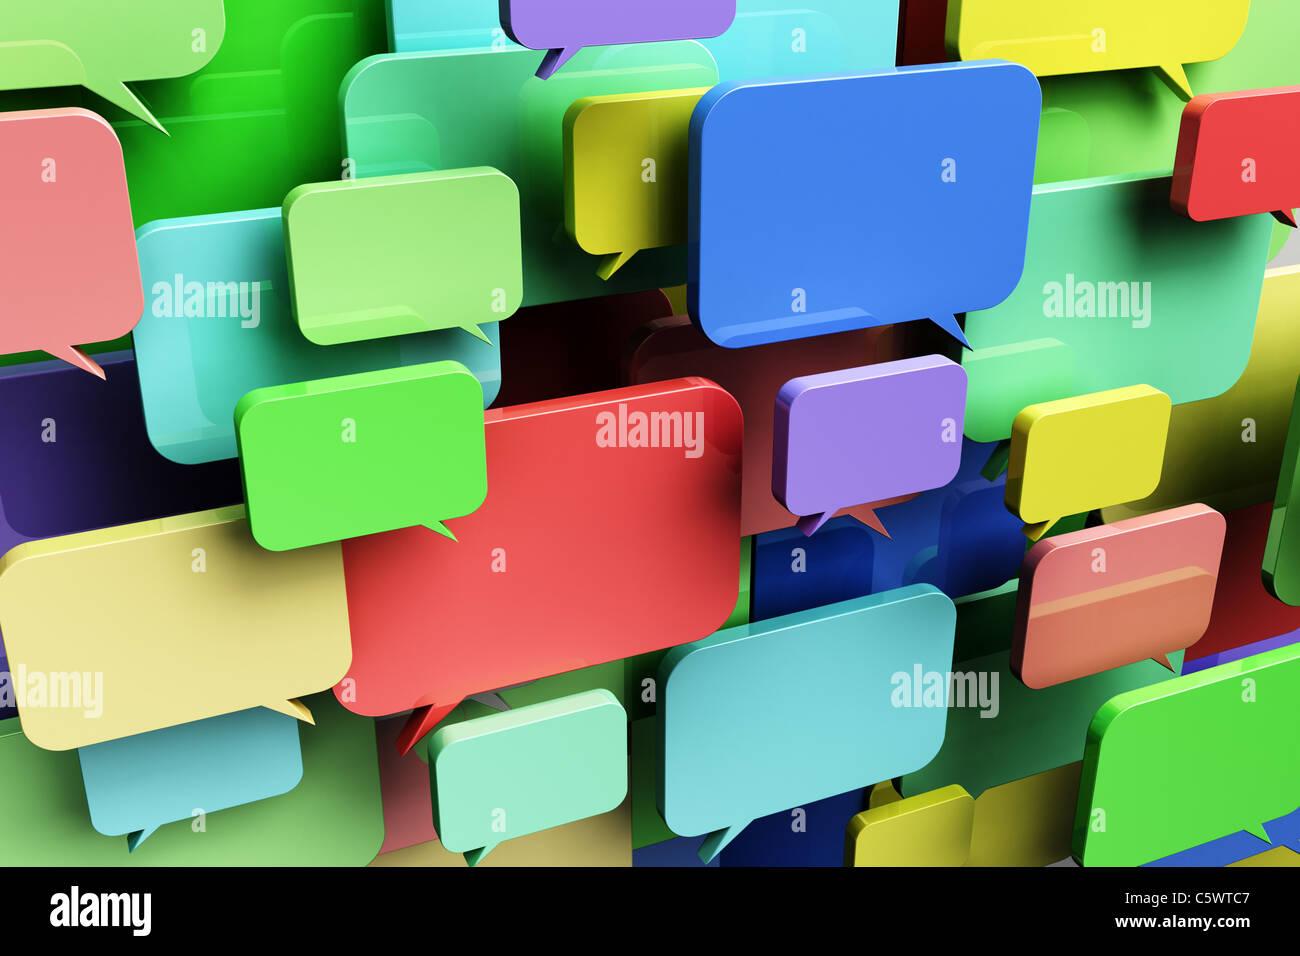 Social networking concept Immagini Stock